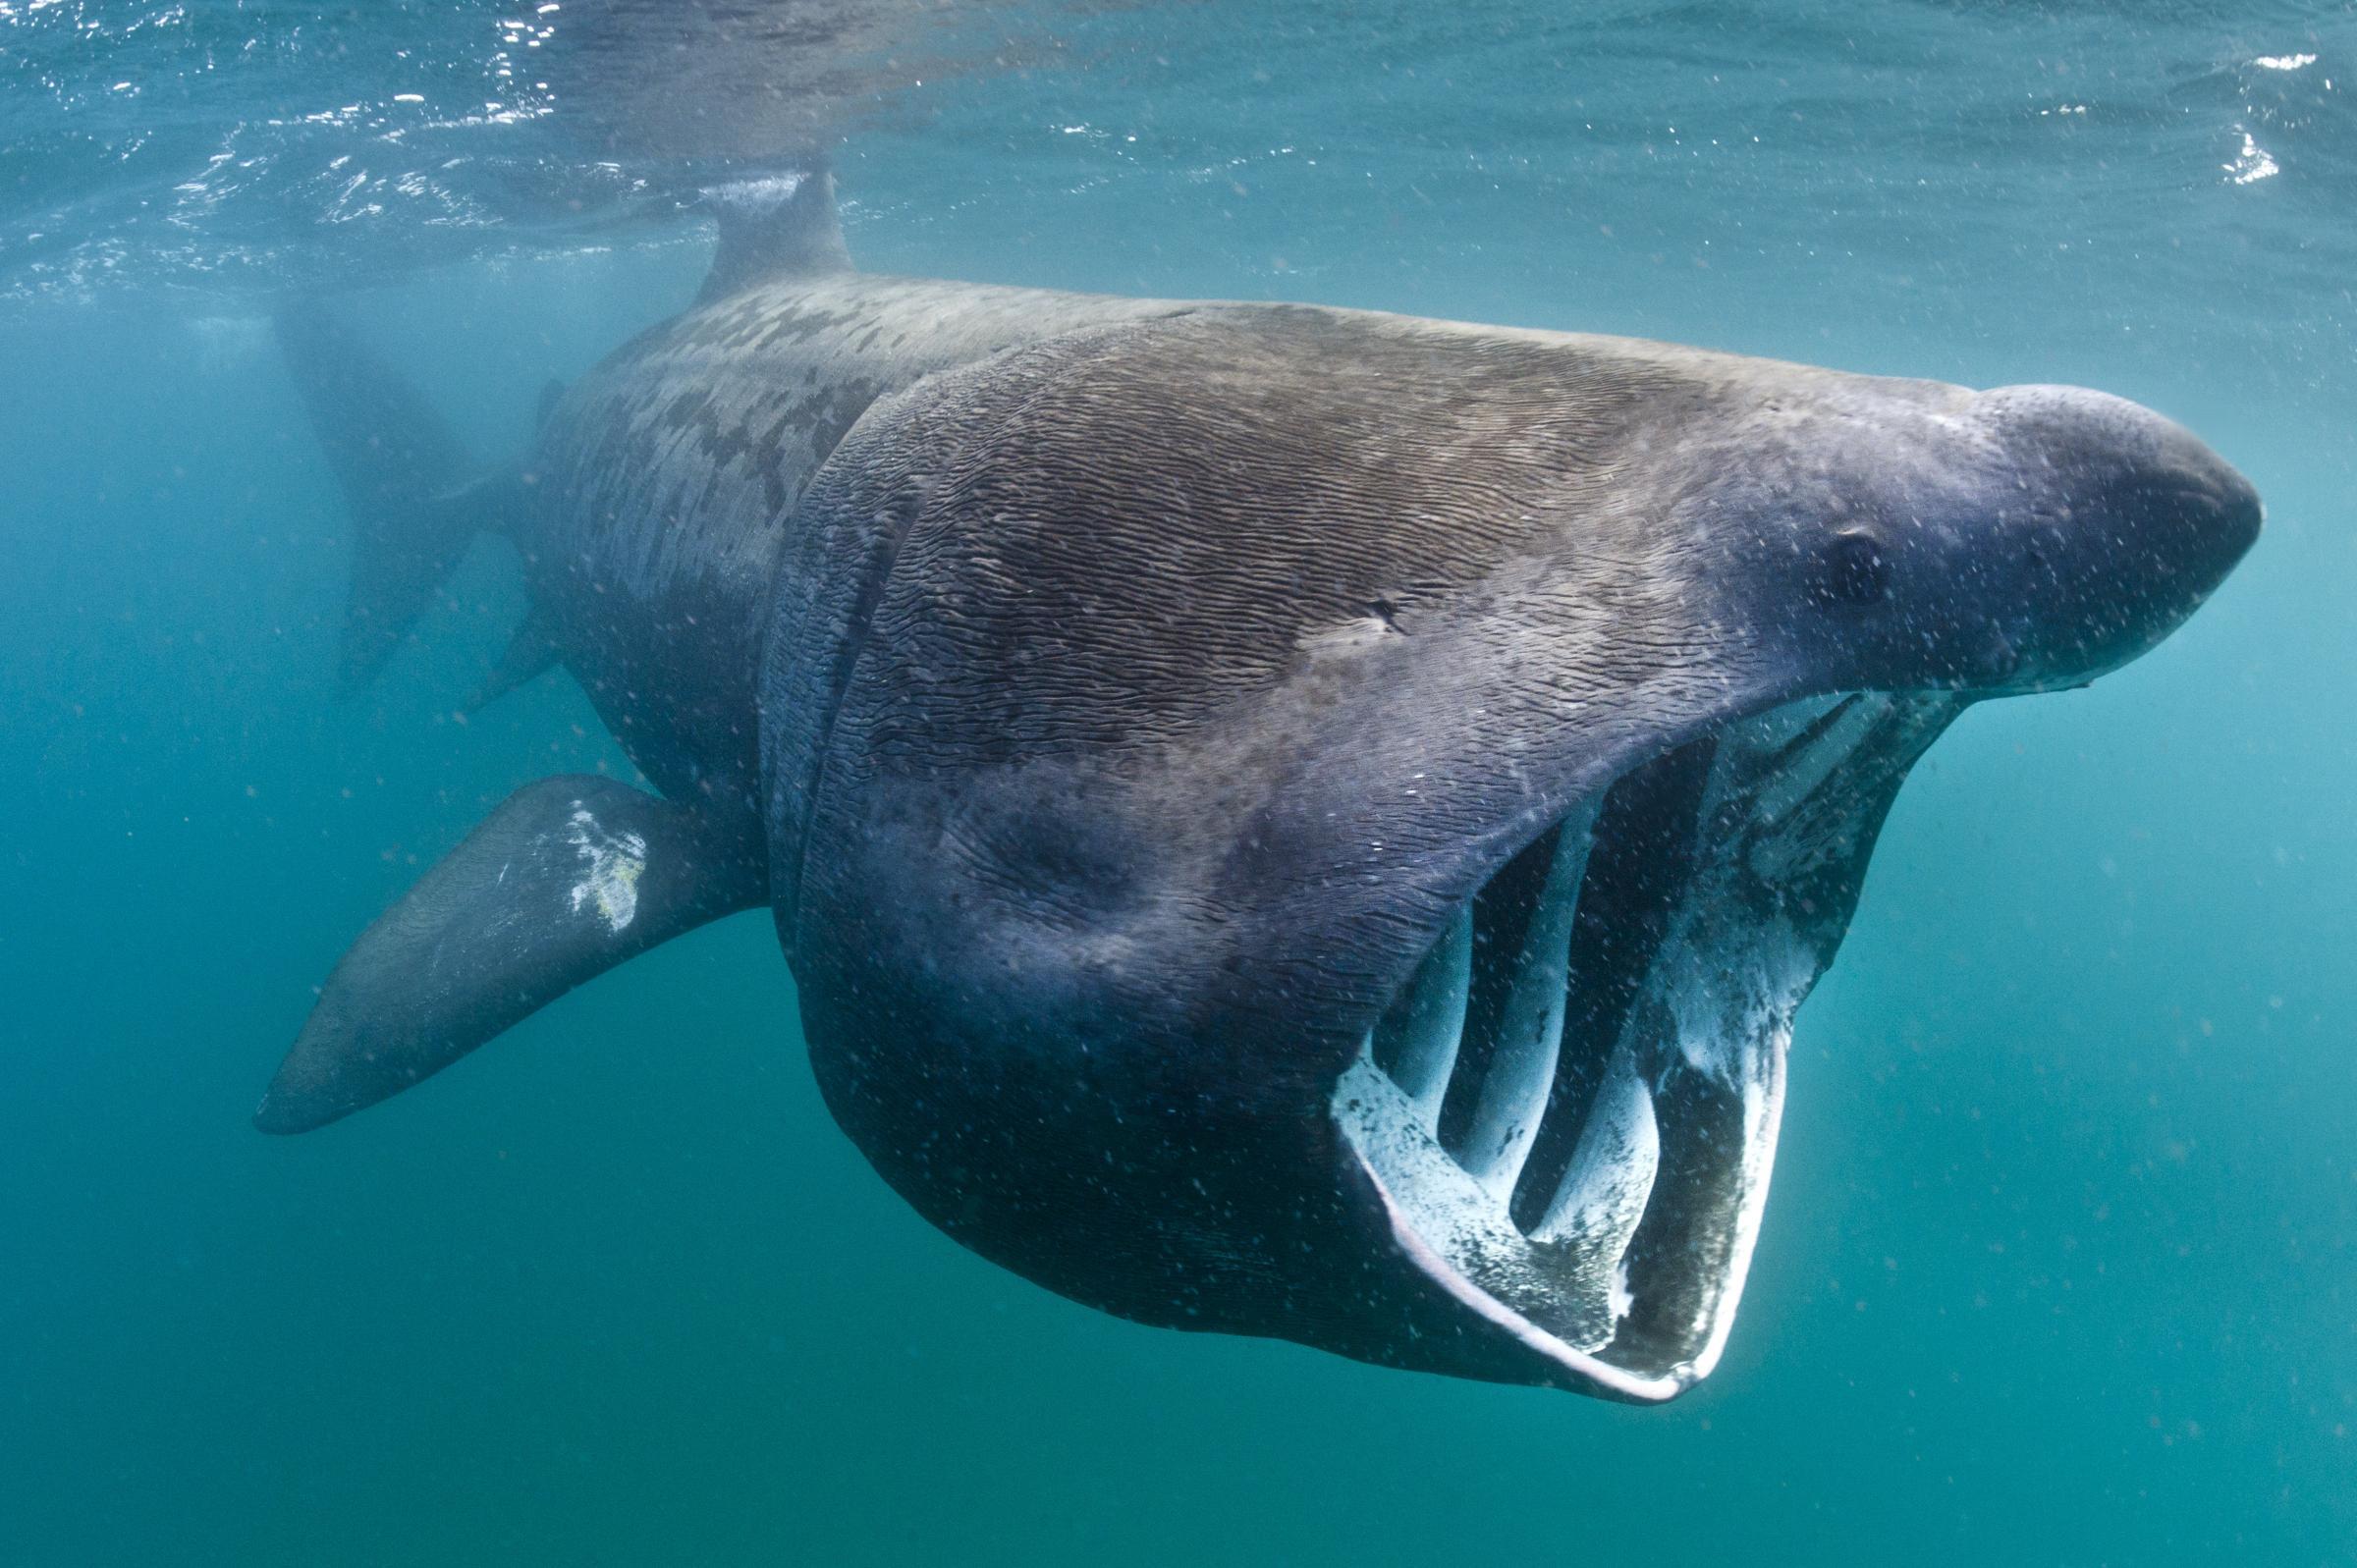 REMUS SharkCam to reveal secret life of sharks